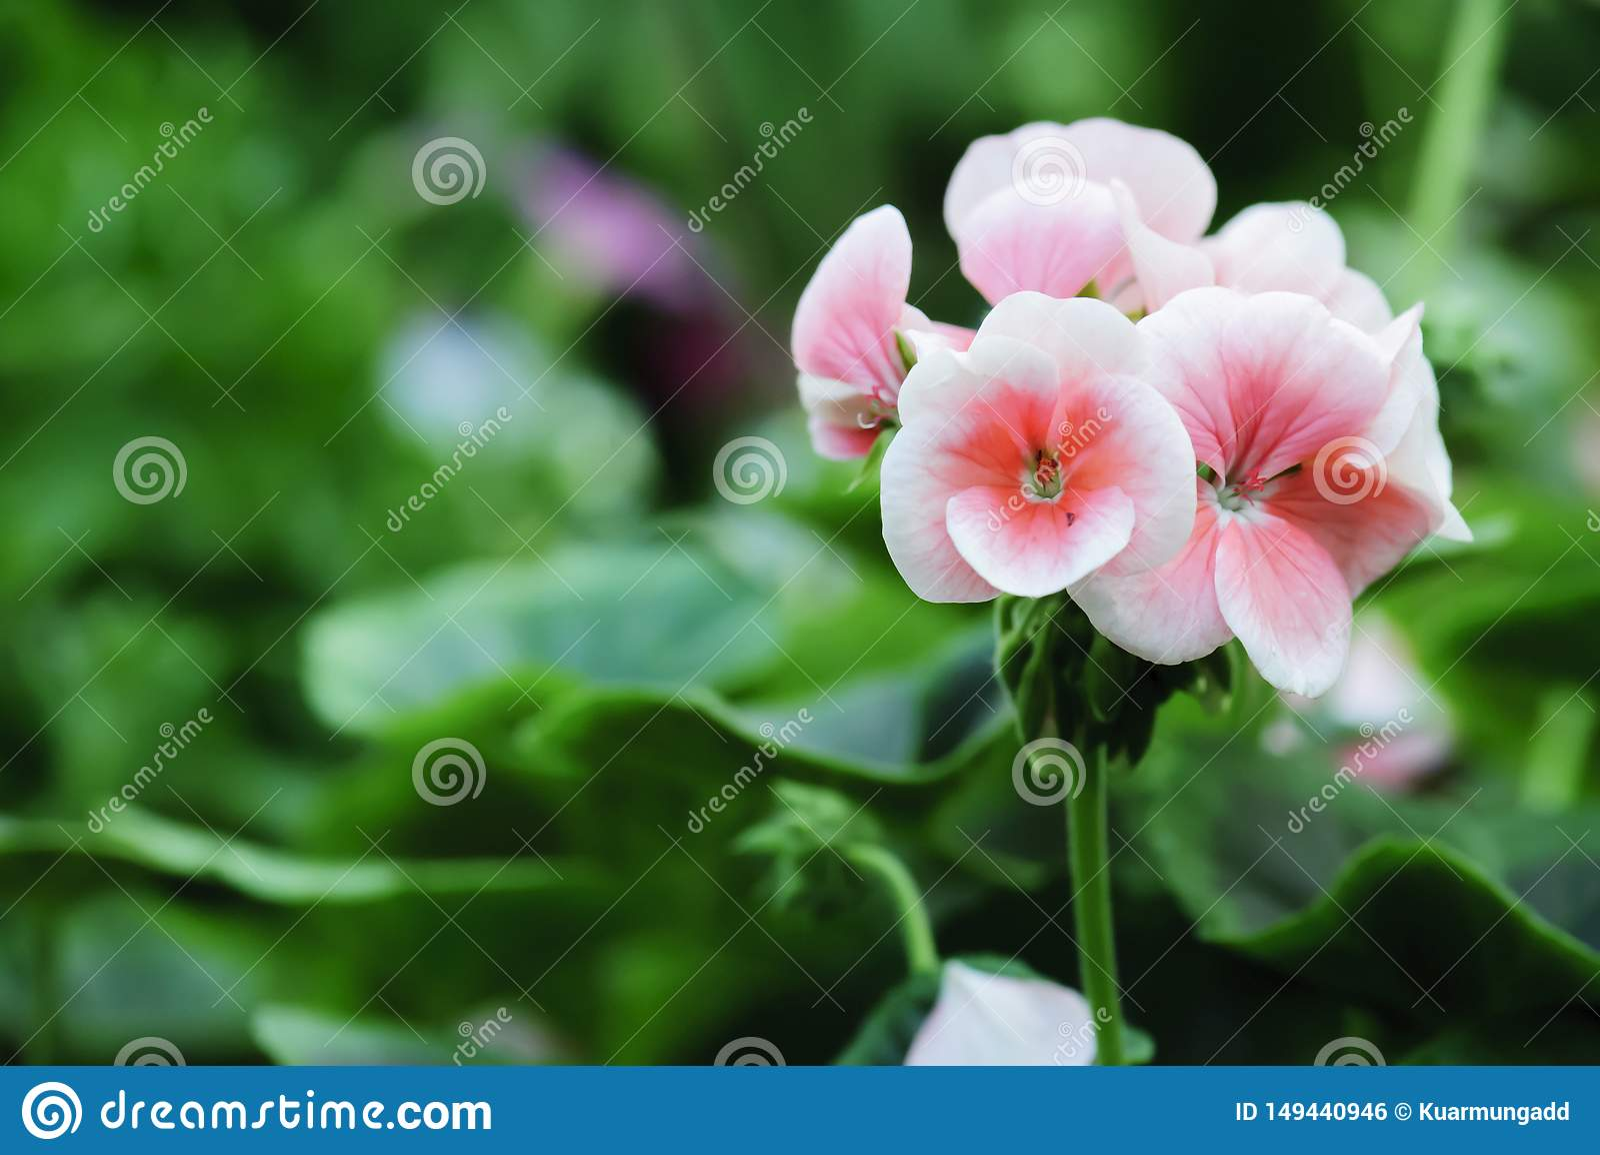 Geranium flowers bloom in the summer